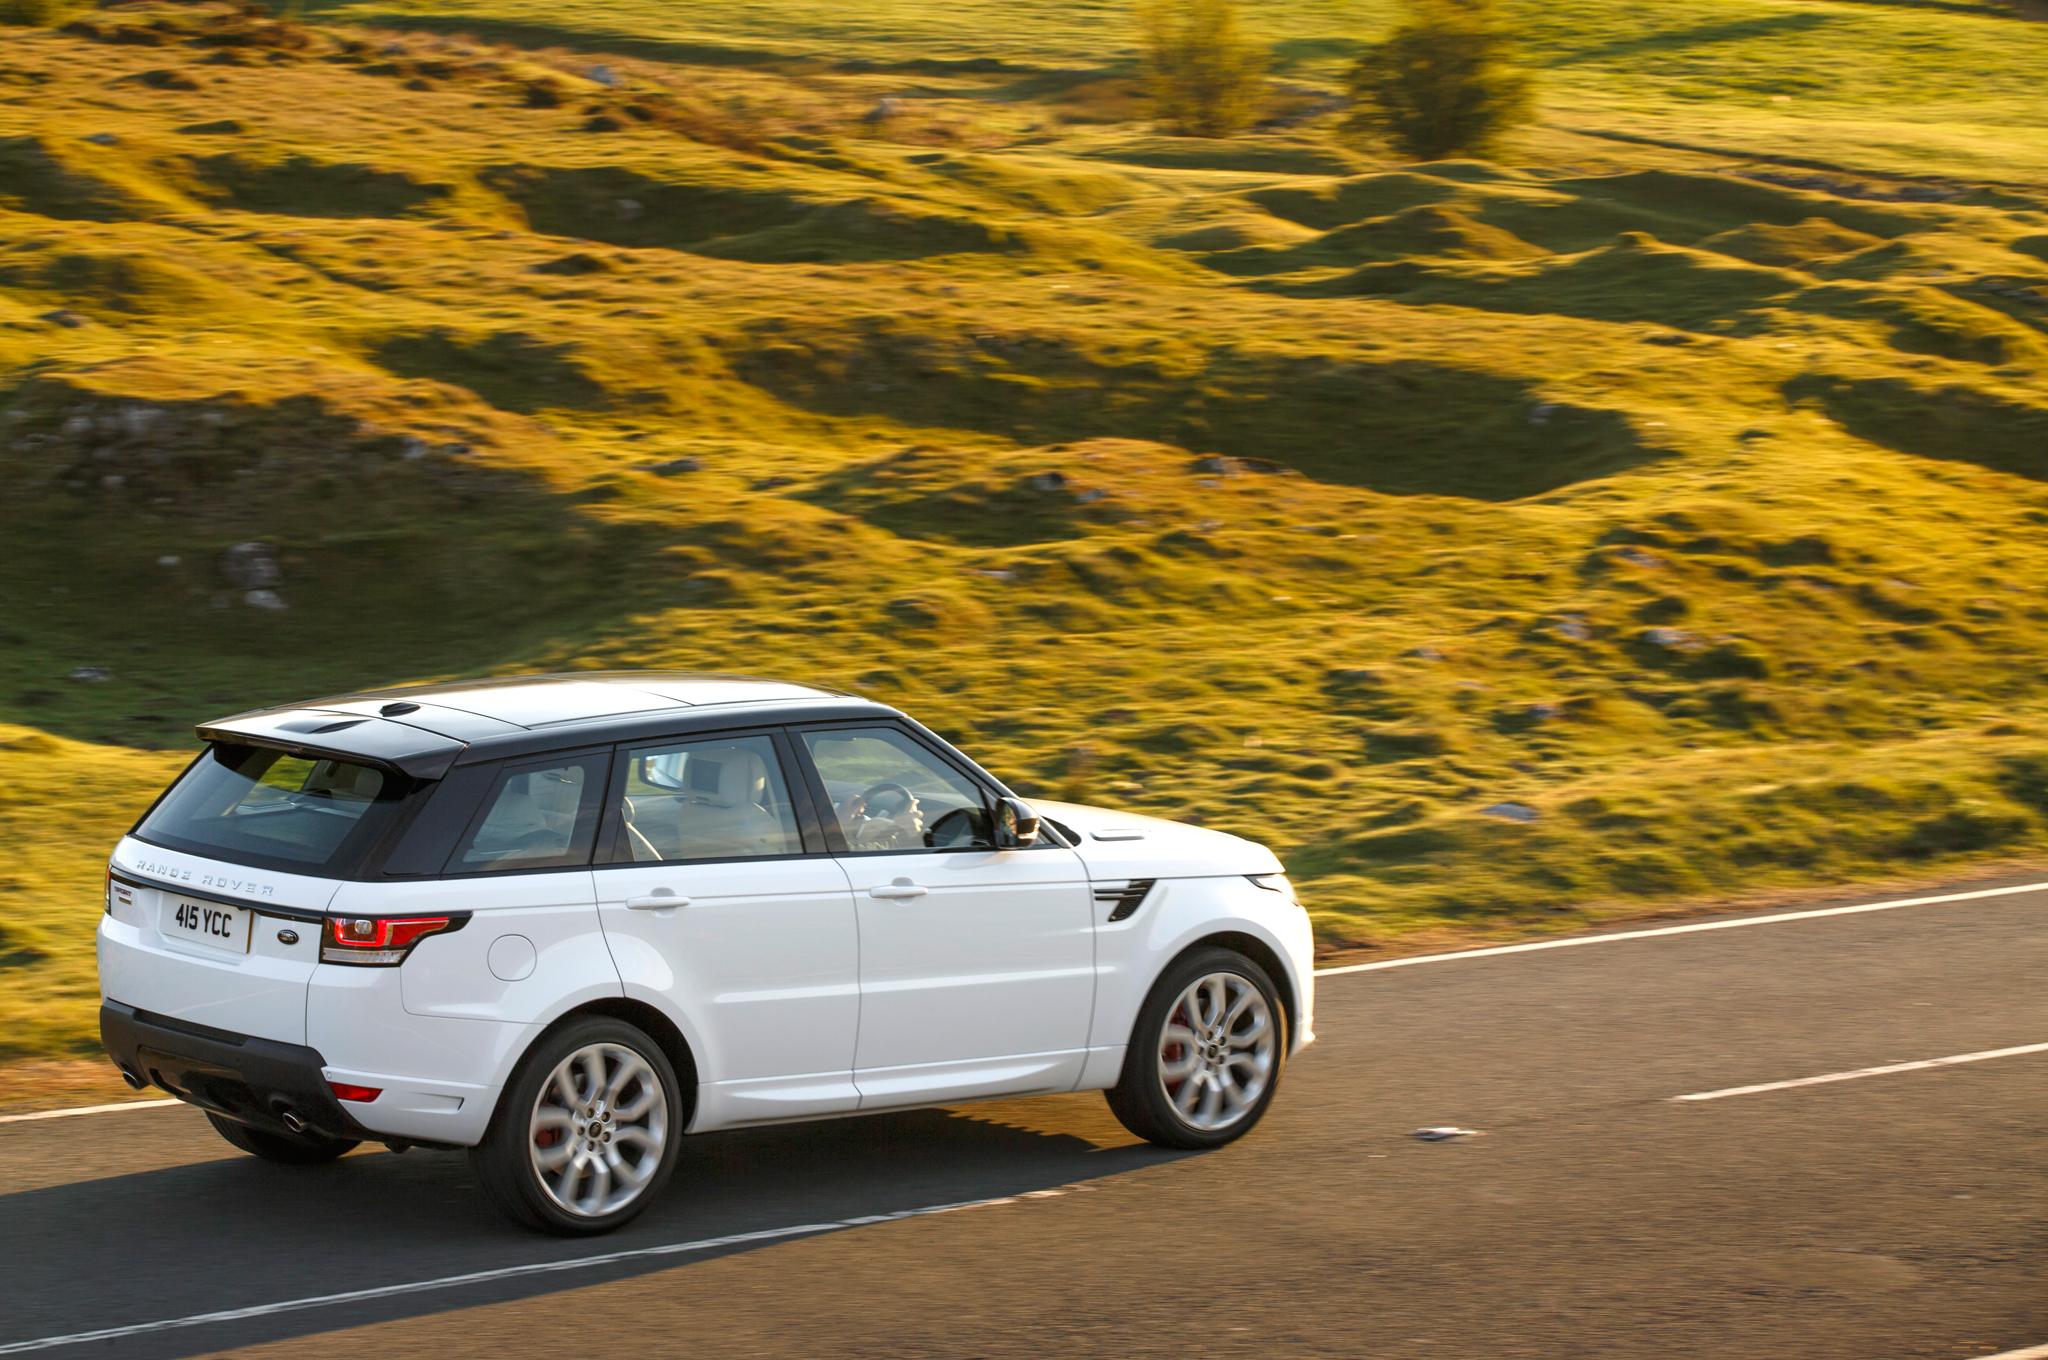 2014 Range Rover Sport Perfect Tri fecta